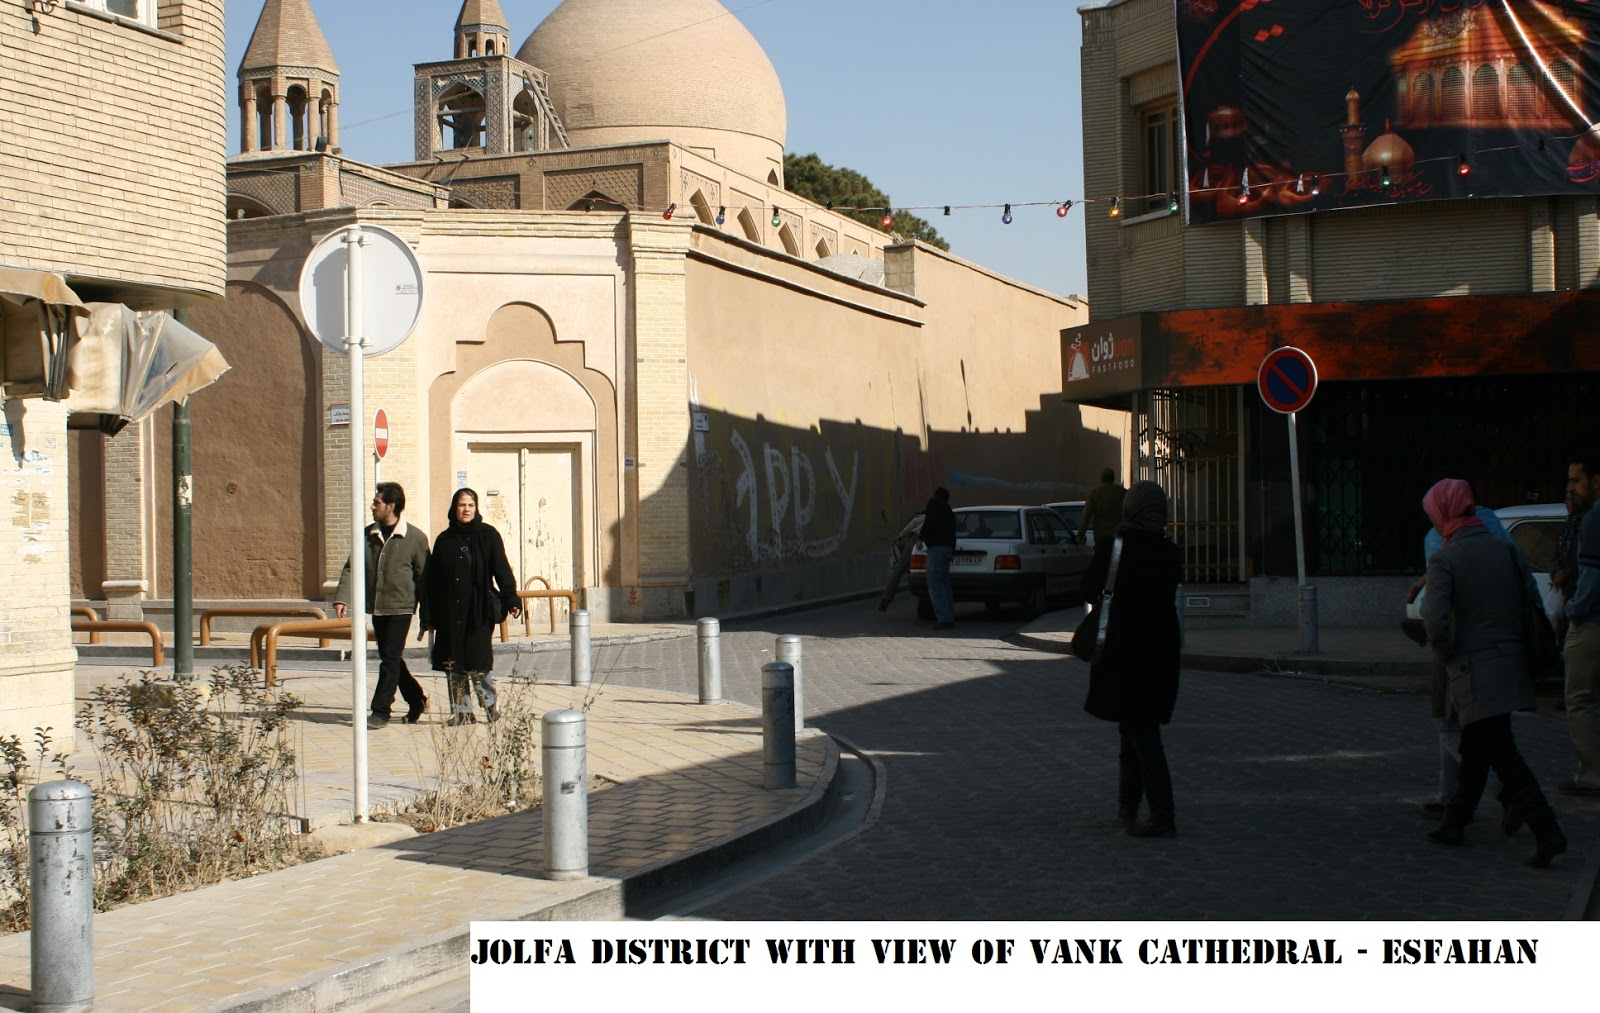 jolfa%2Bdistrict%2Besfahan.jpg